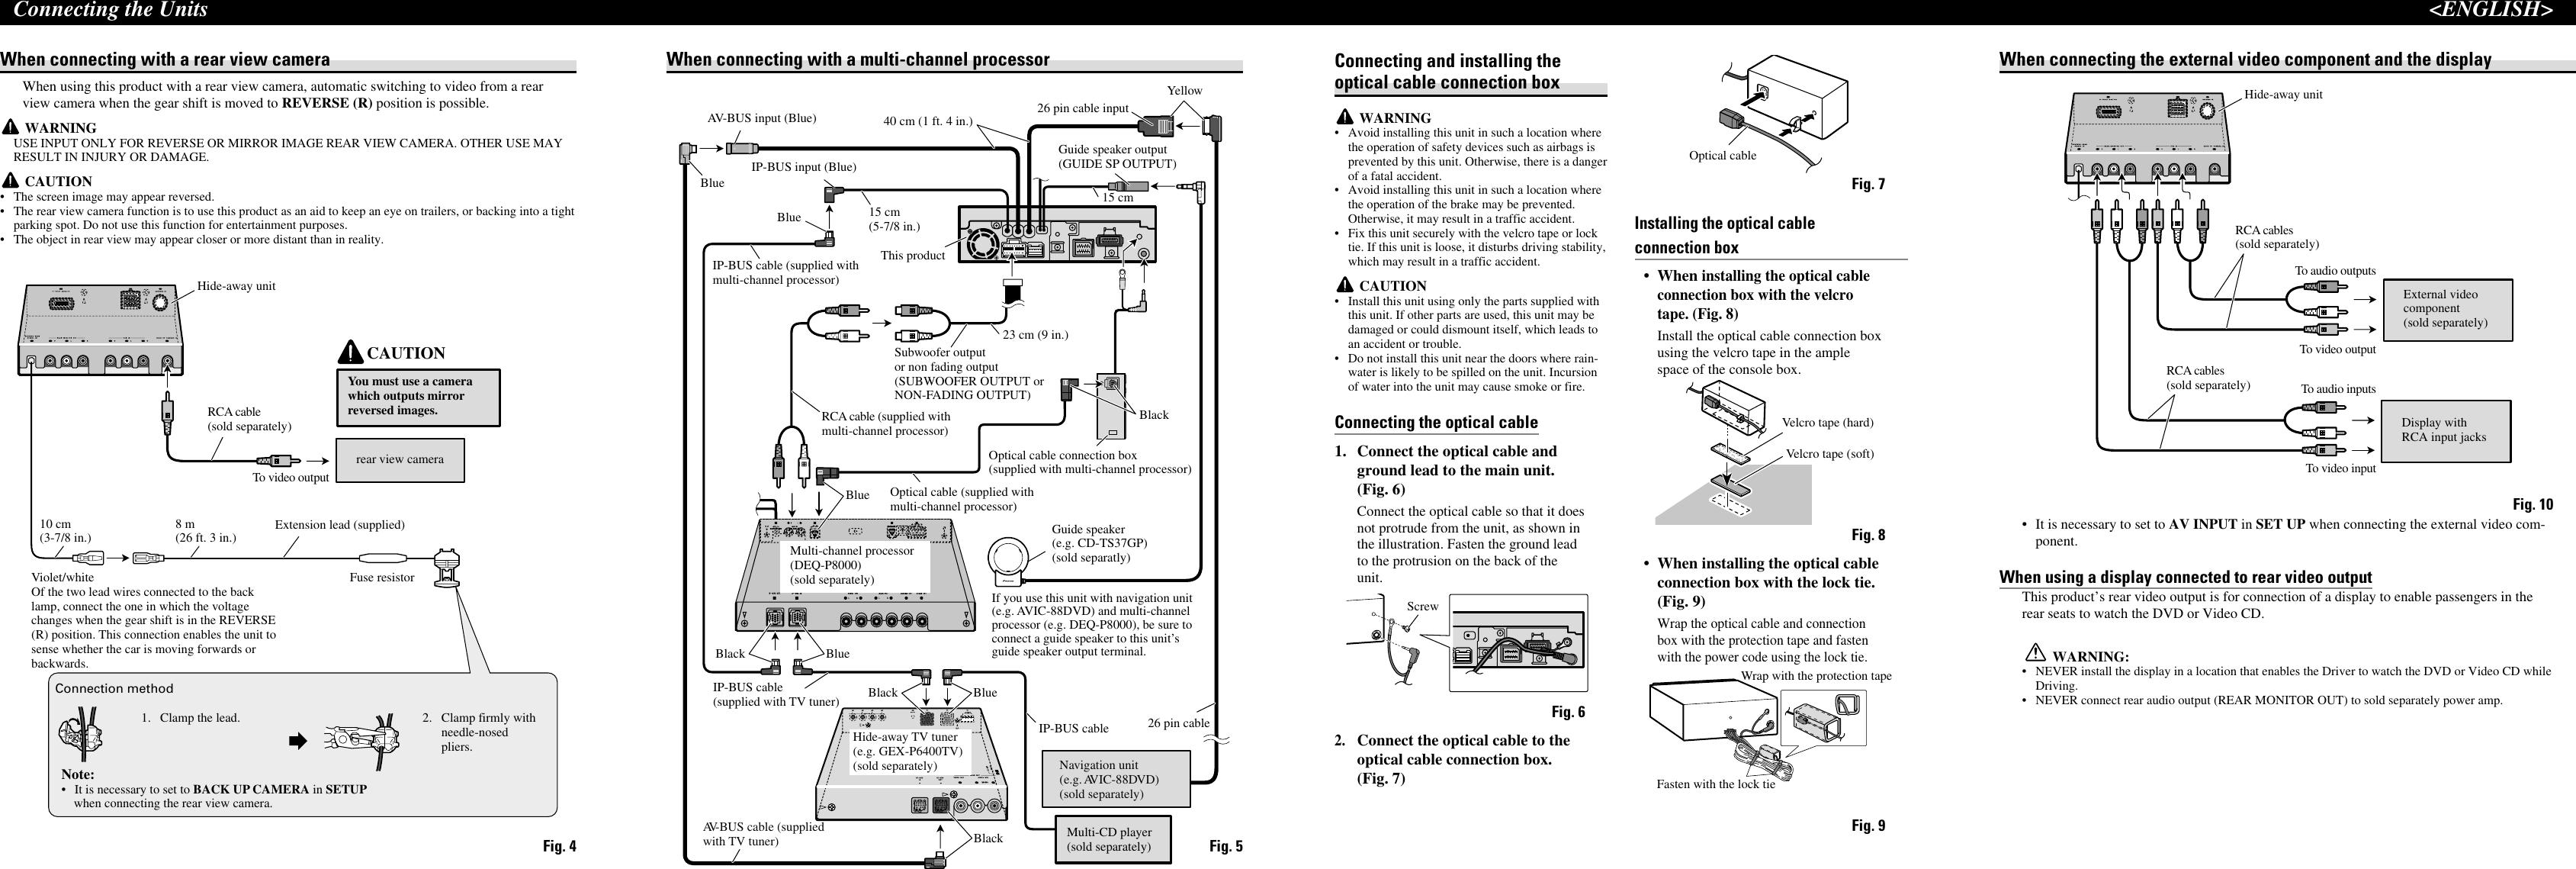 Pioneer Avh P6600Dvd Wiring Diagram from static-cdn.imageservice.cloud